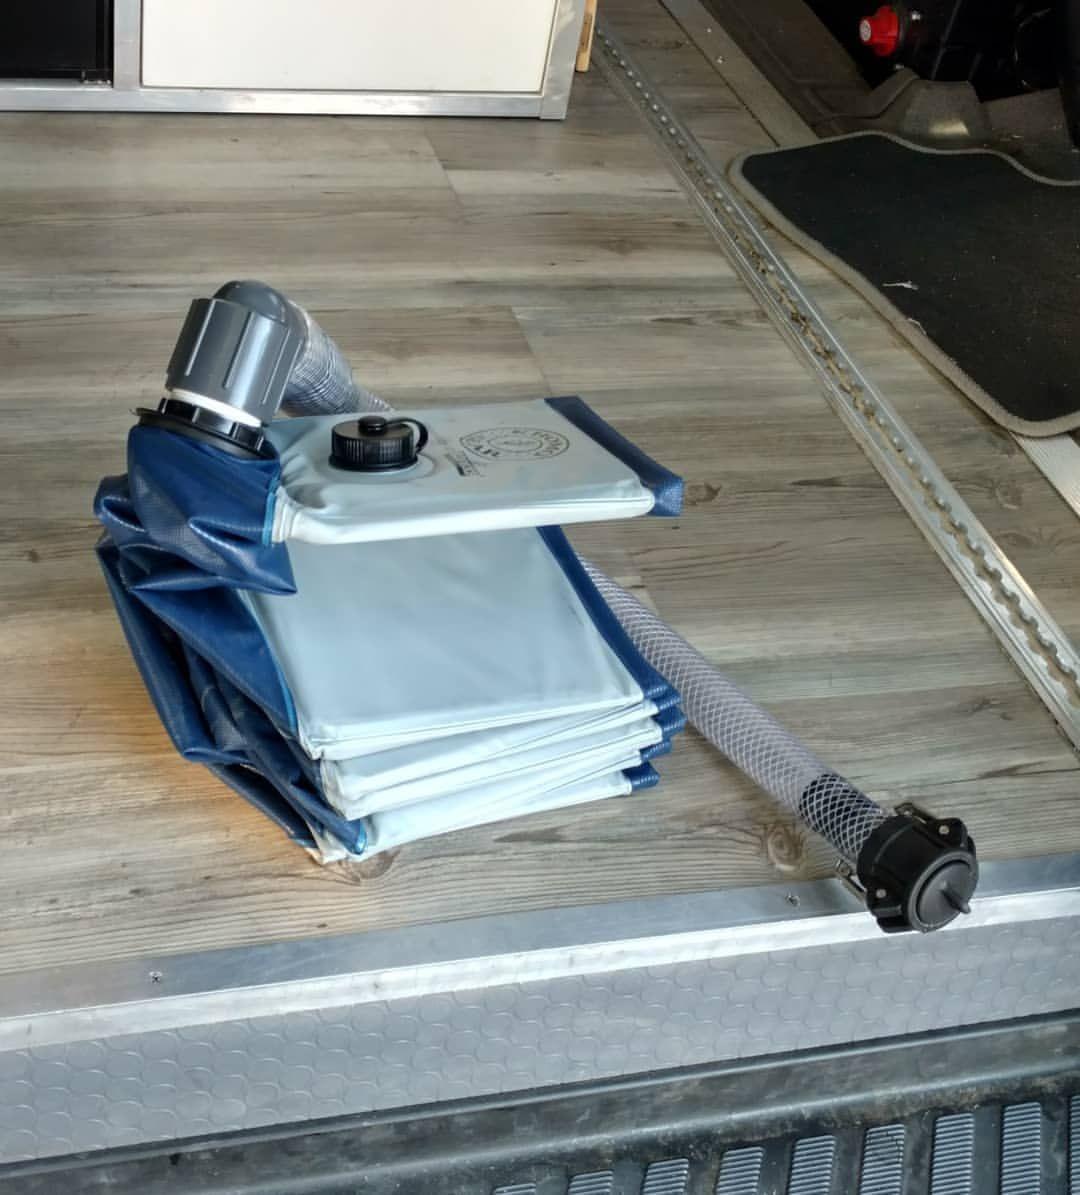 DIY portable indoor van shower ☑ 🔸Collapsible 🔸Space saving ...